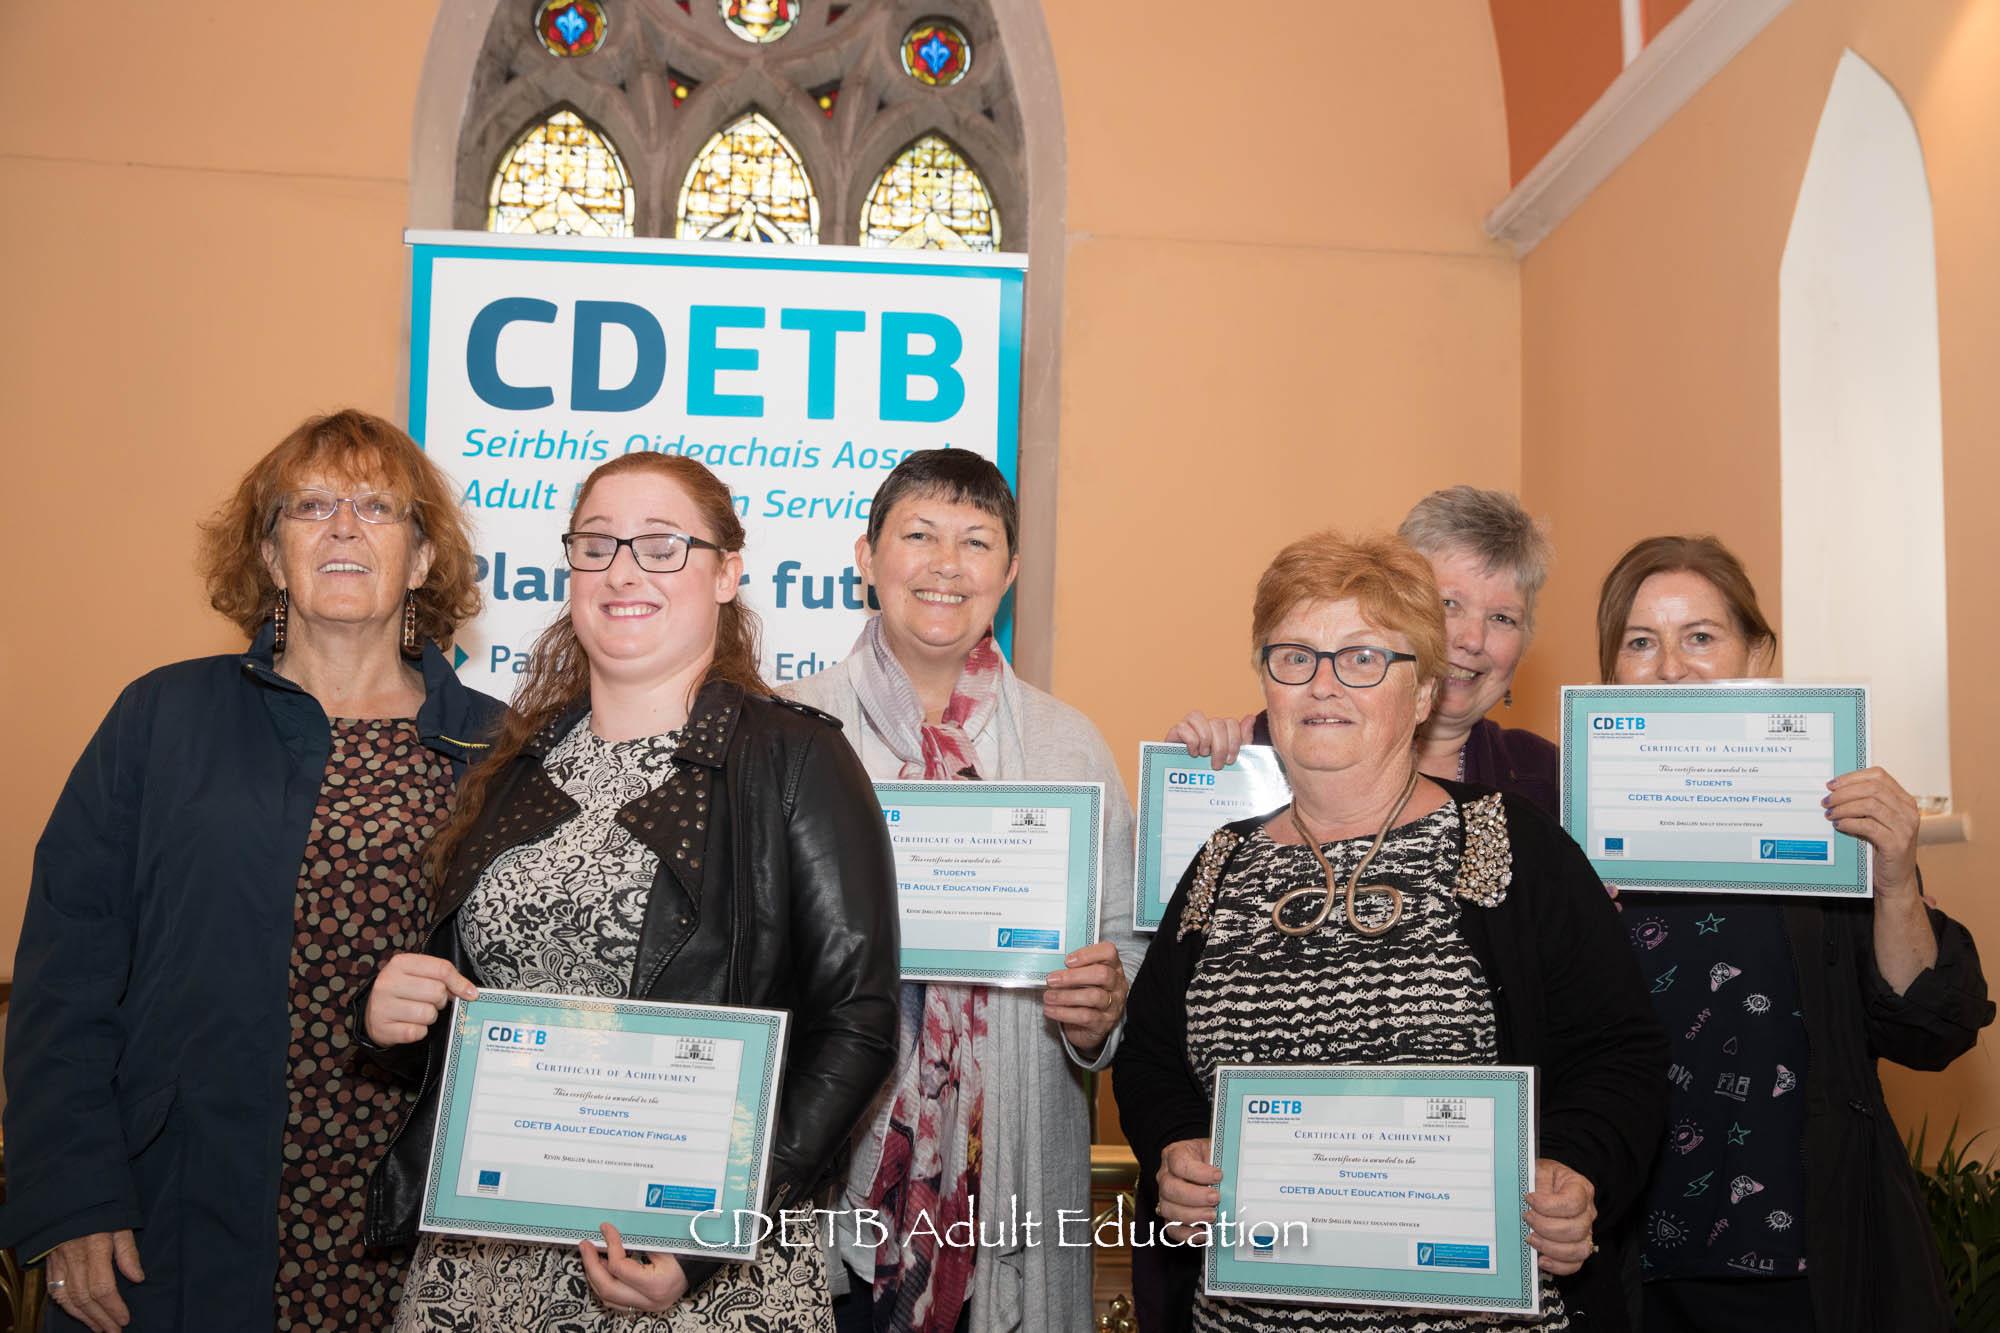 CDETB Adult Education-2.jpg